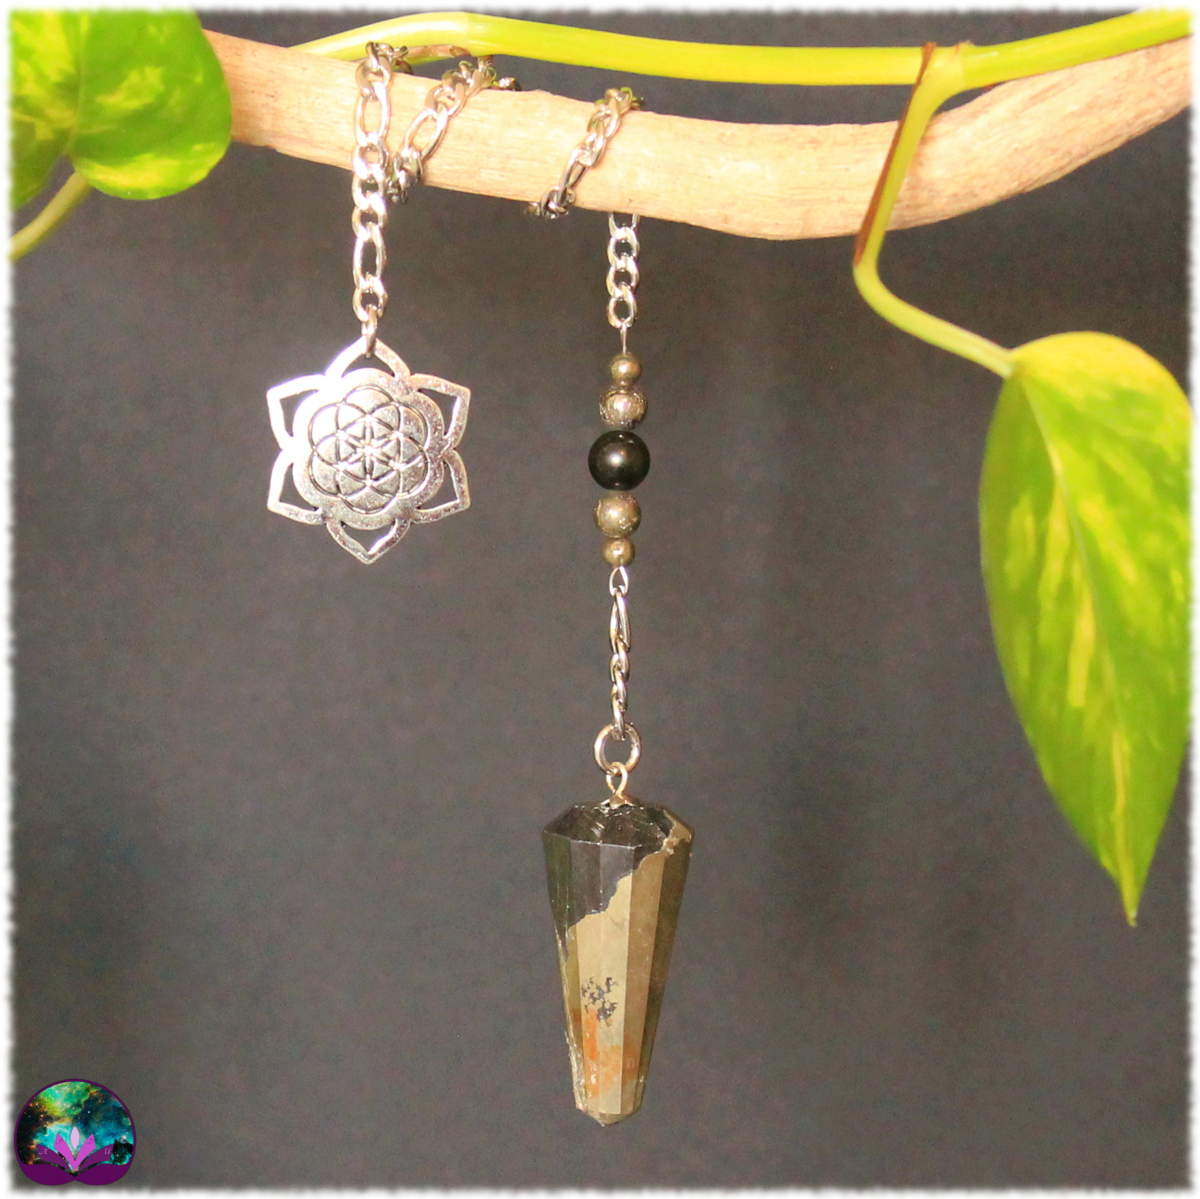 Pendule Lourd pyrite et obsidienne oeil céleste